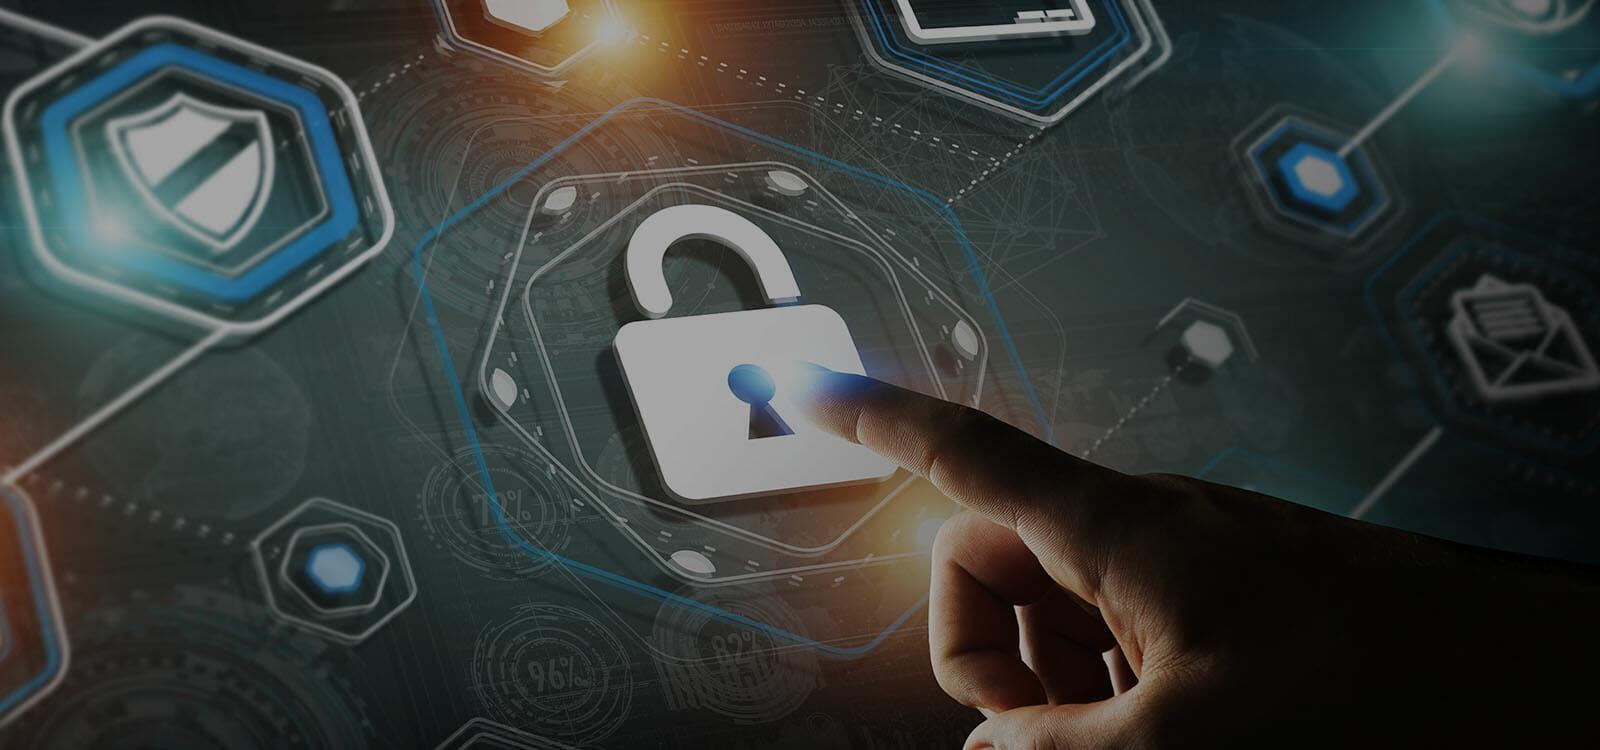 SecurityHero Digital lock security icons pointing